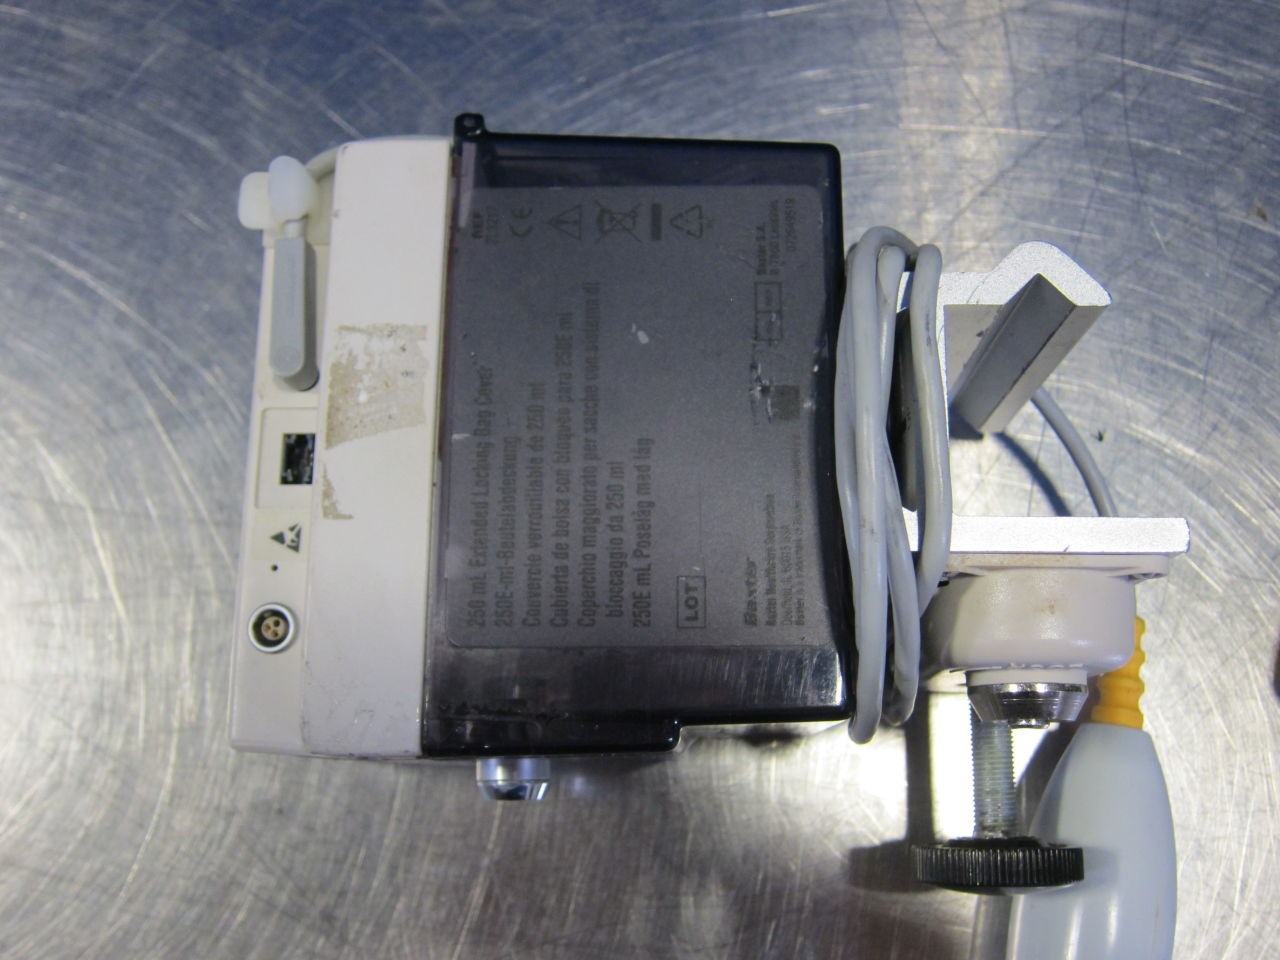 BAXTER I Pump  - Lot of 2 Pump IV Infusion